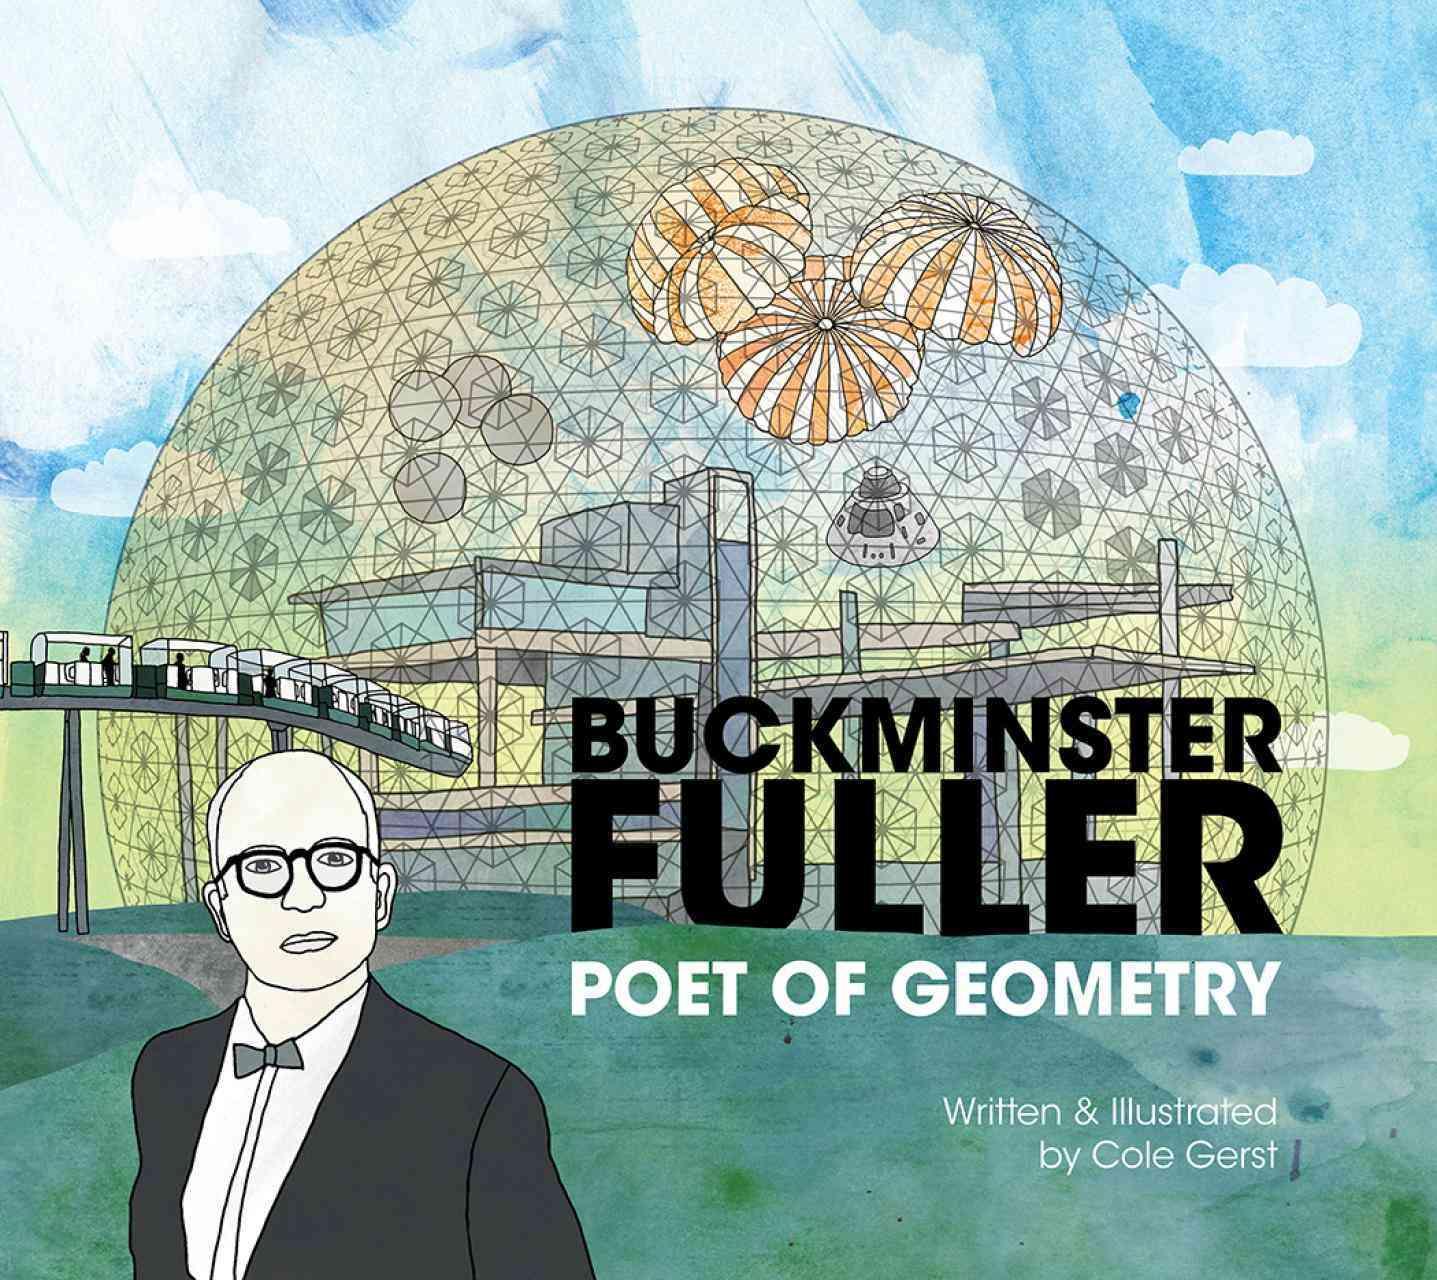 Buckminster Fuller By Gerst, Cole/ Gerst, Cole (ILT)